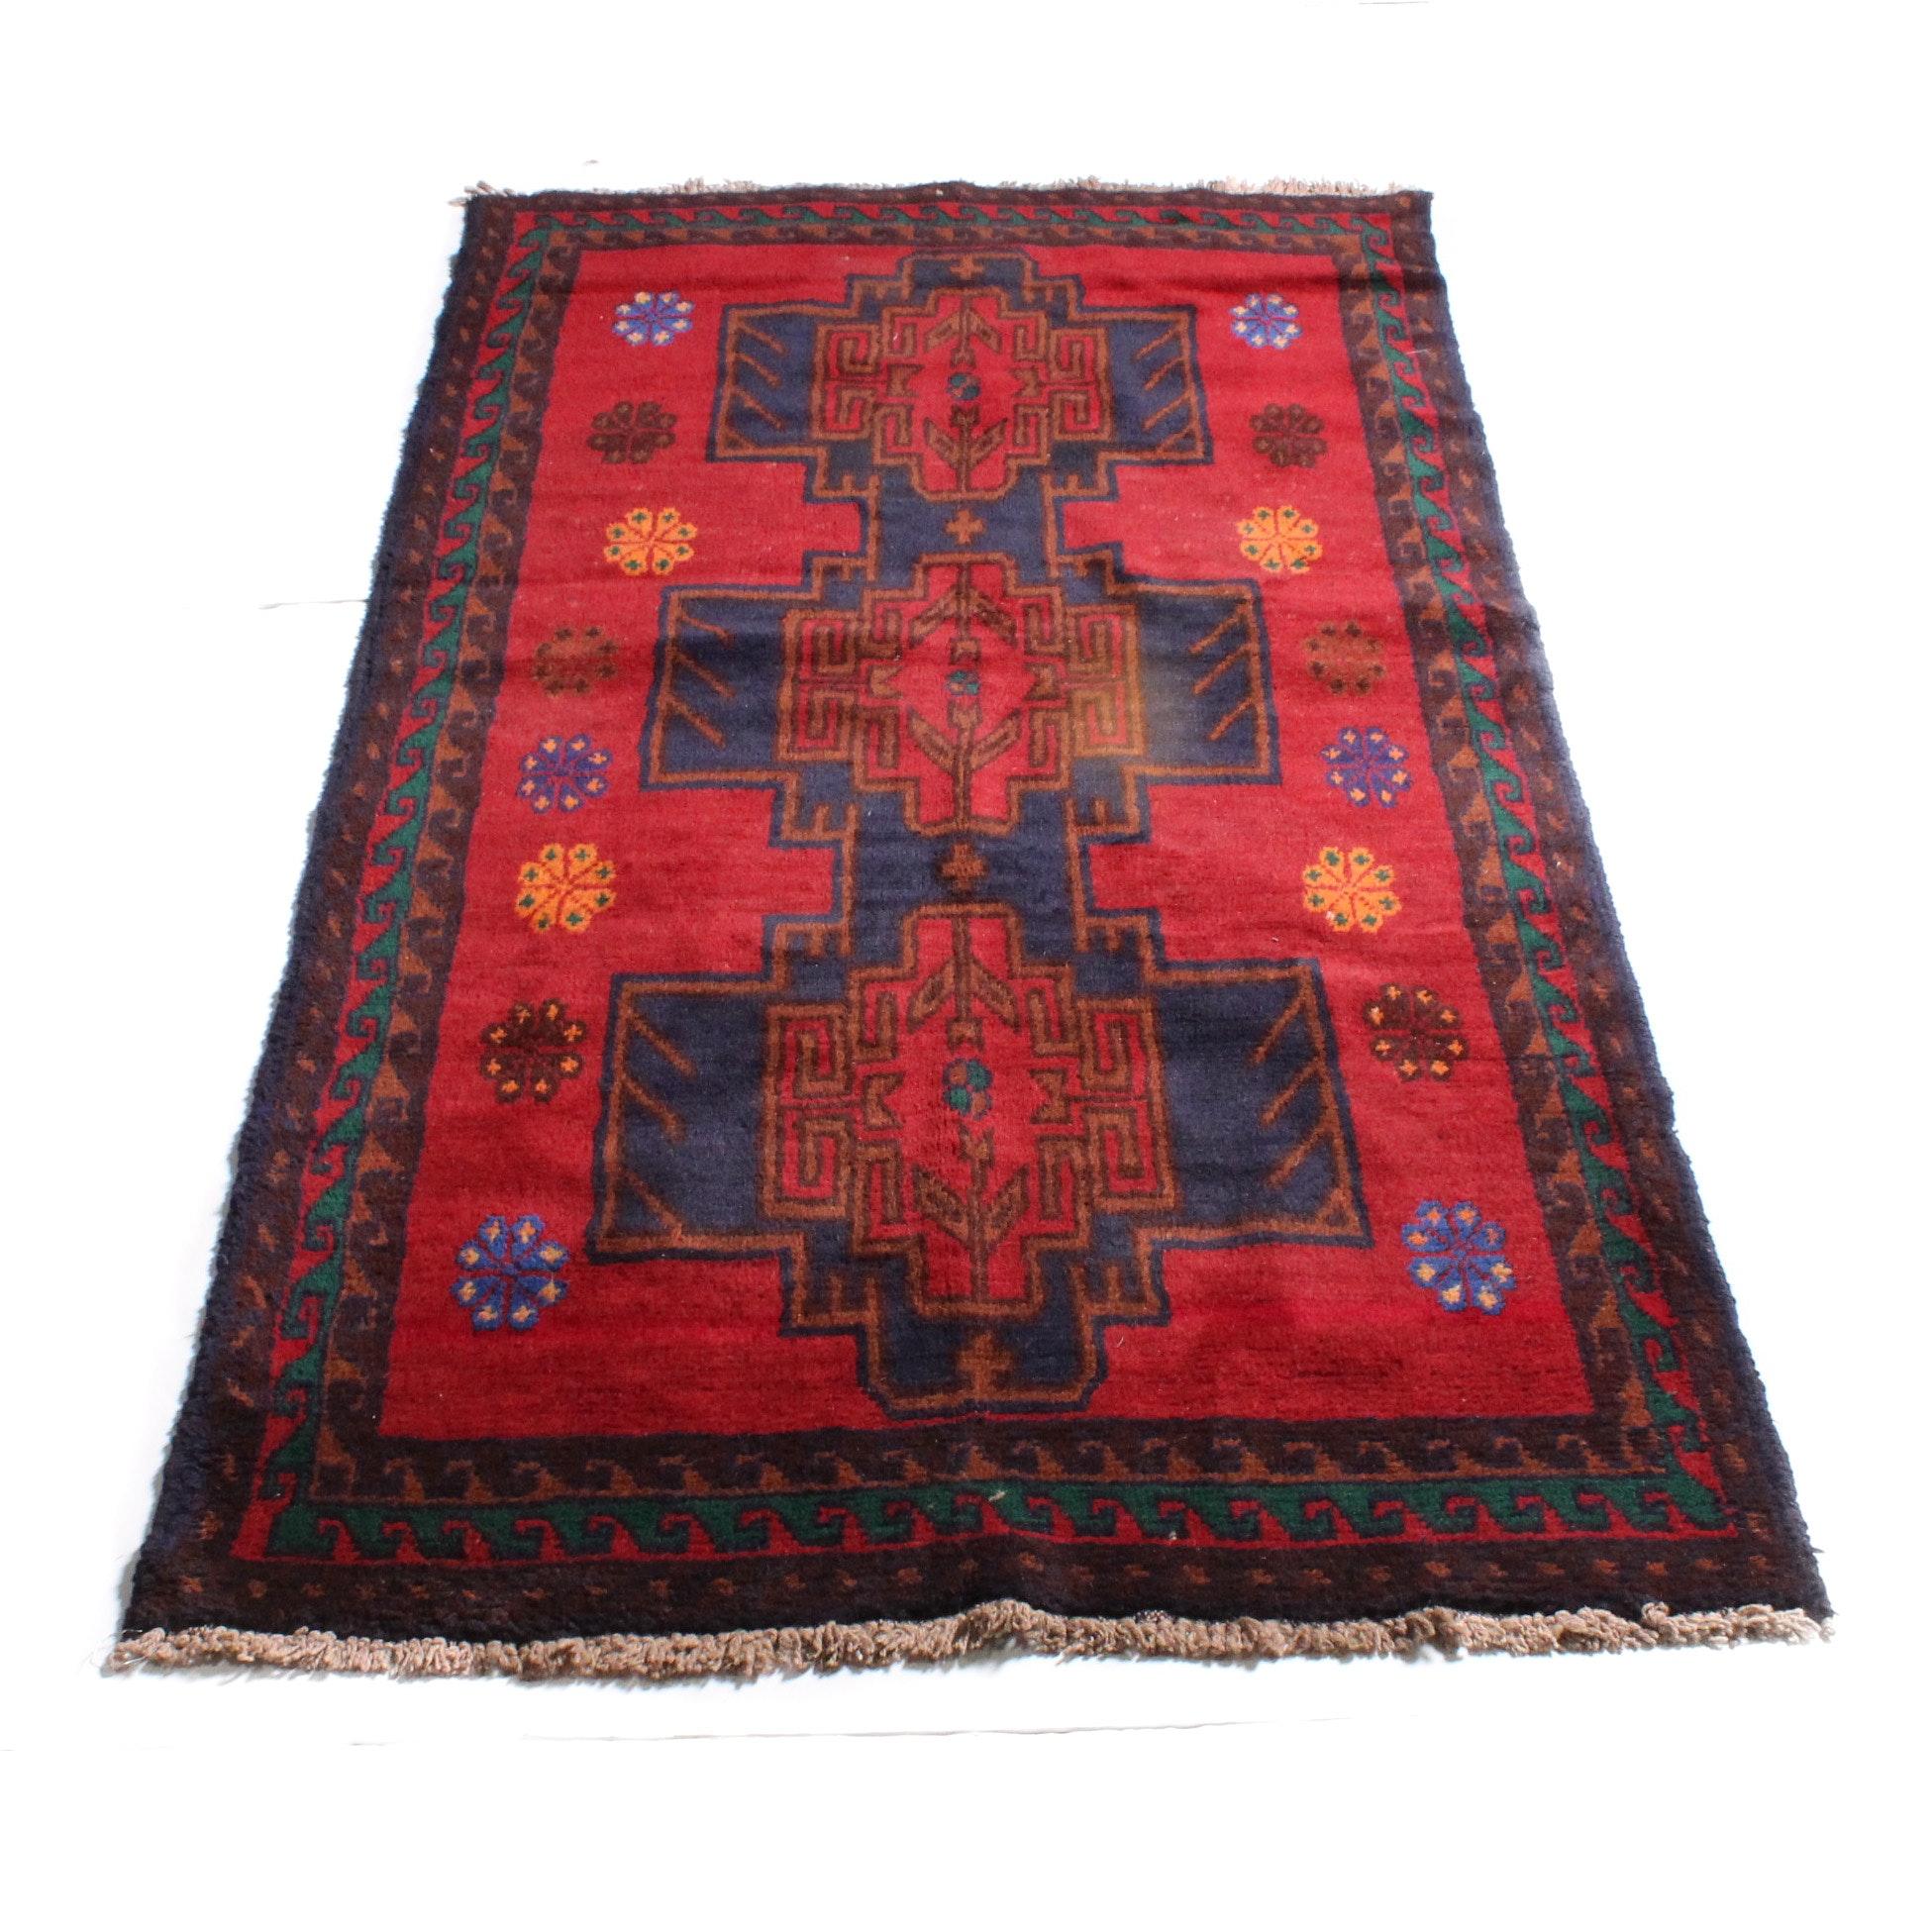 3'4 x 6'5 Hand-Knotted Afghan Kazak Rug